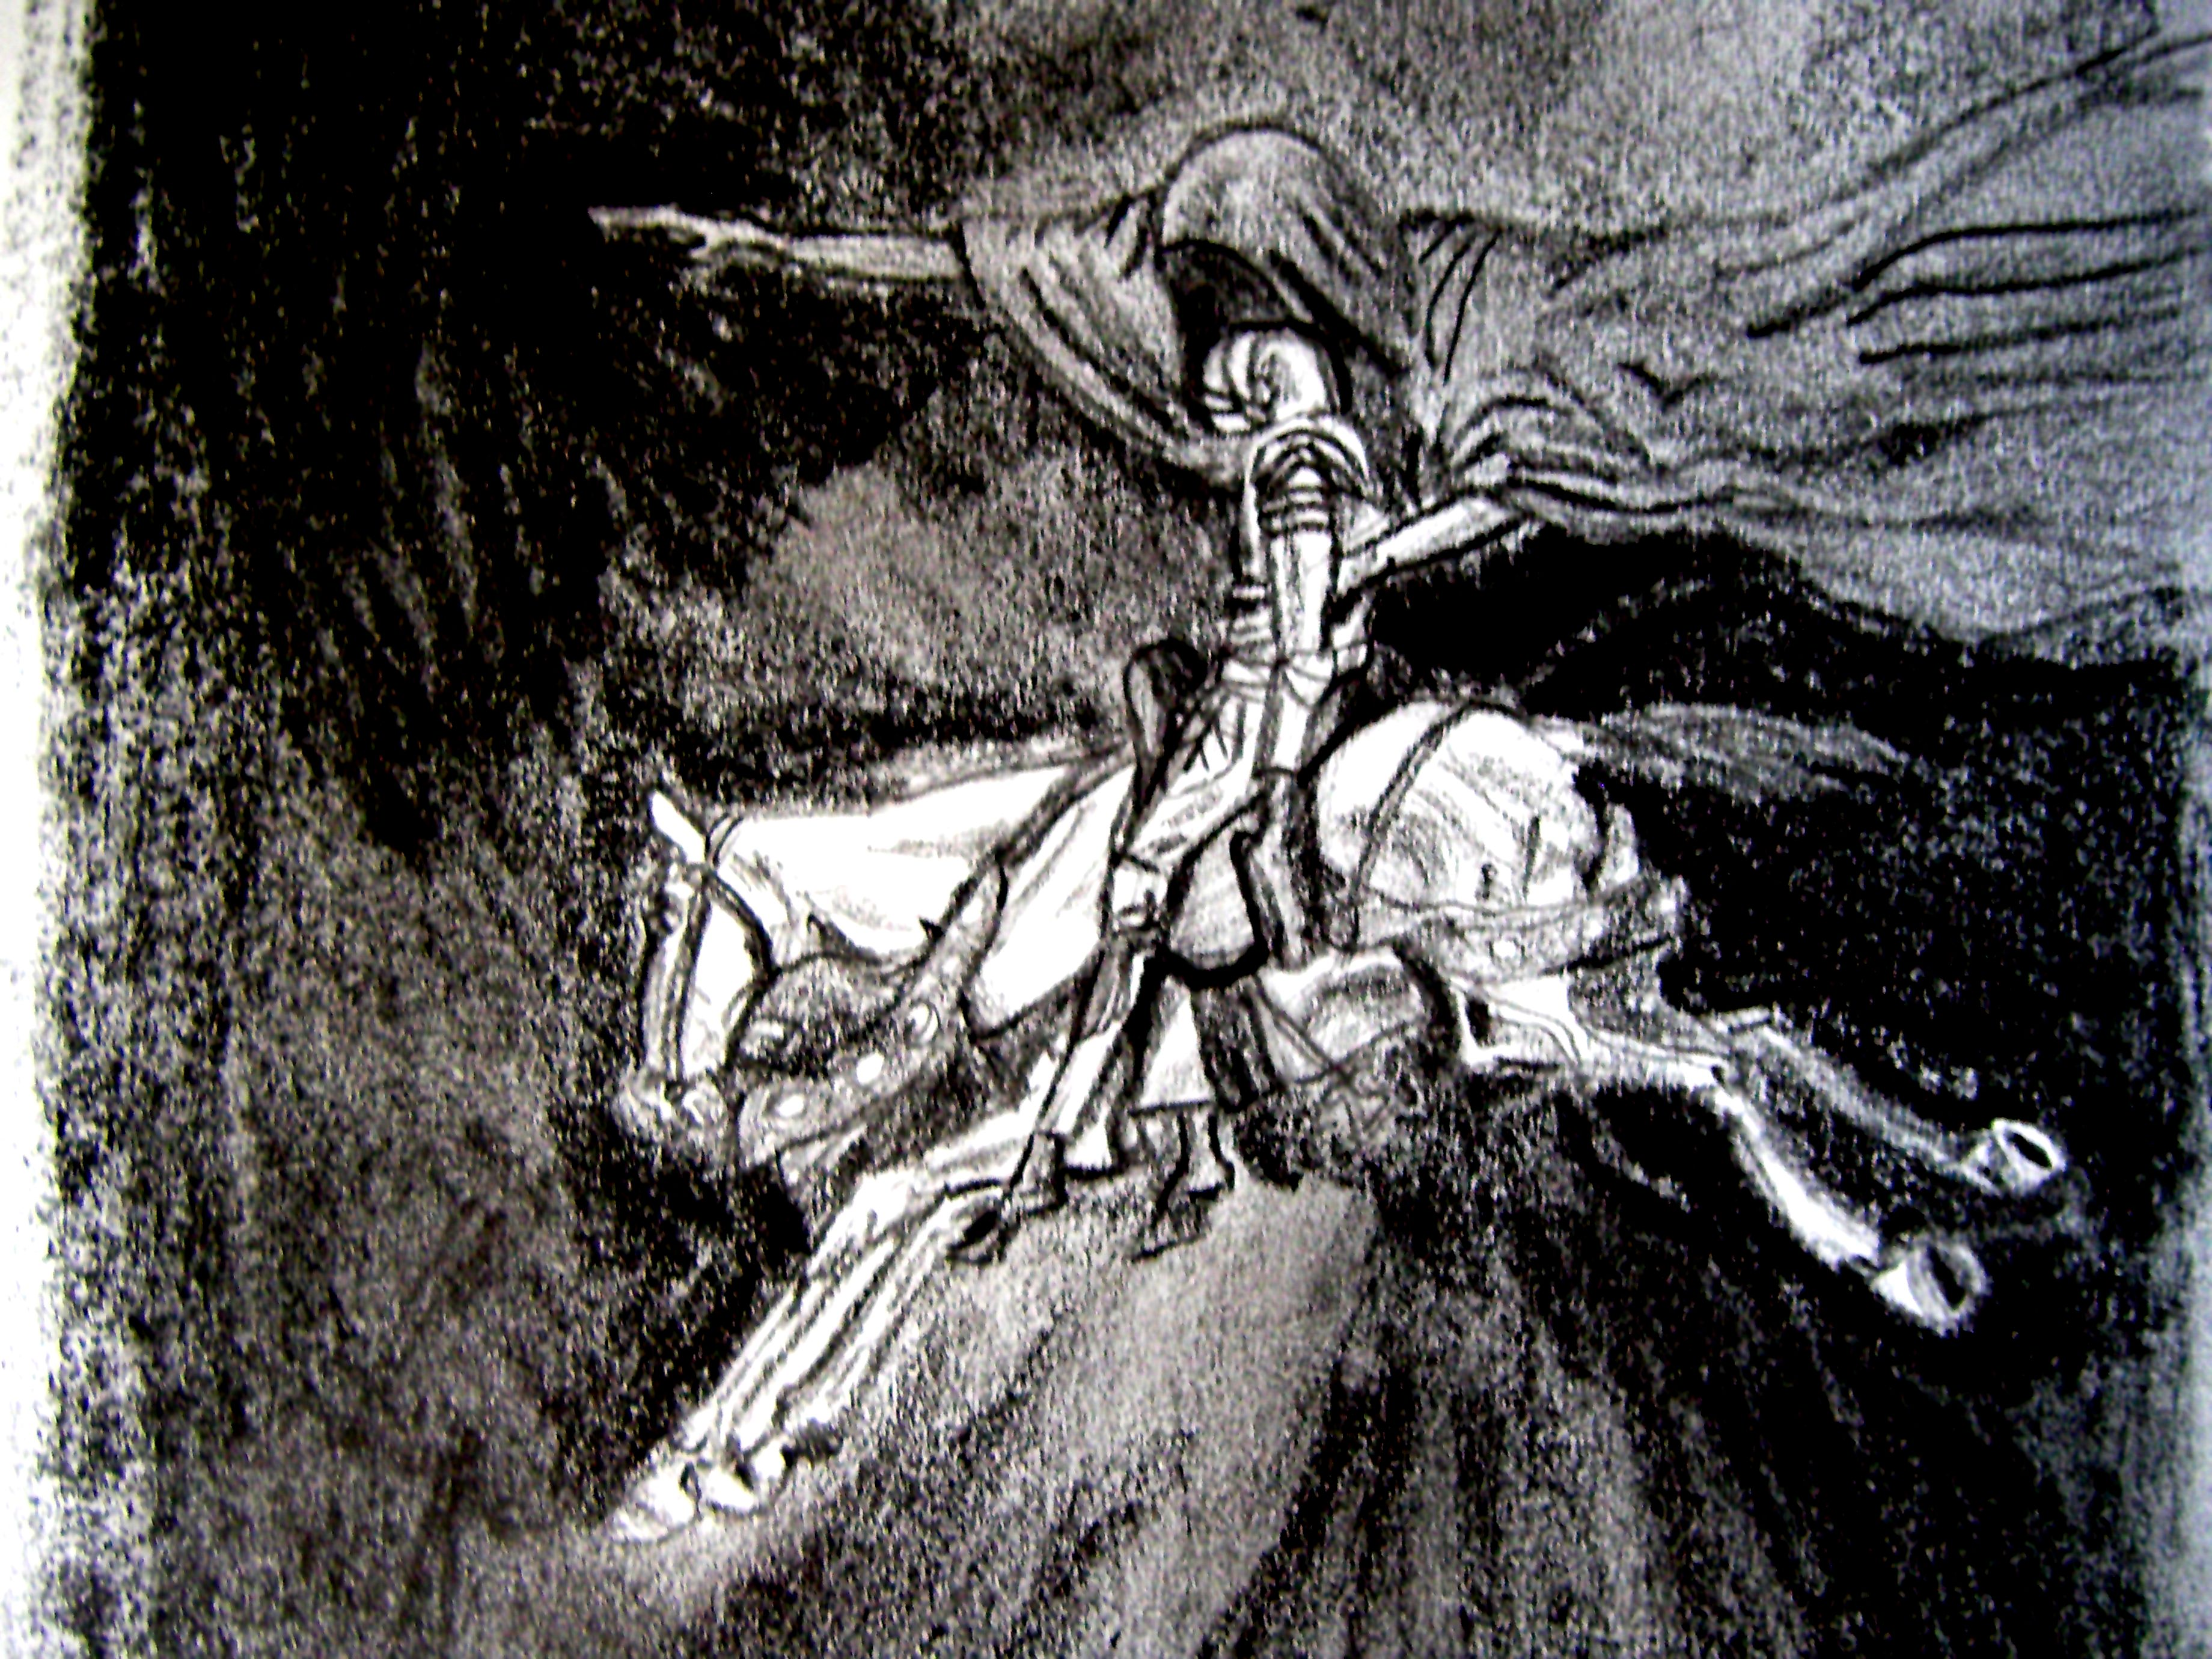 Edgar Allan Poe Documentary (2014) - 167 years ago today ...